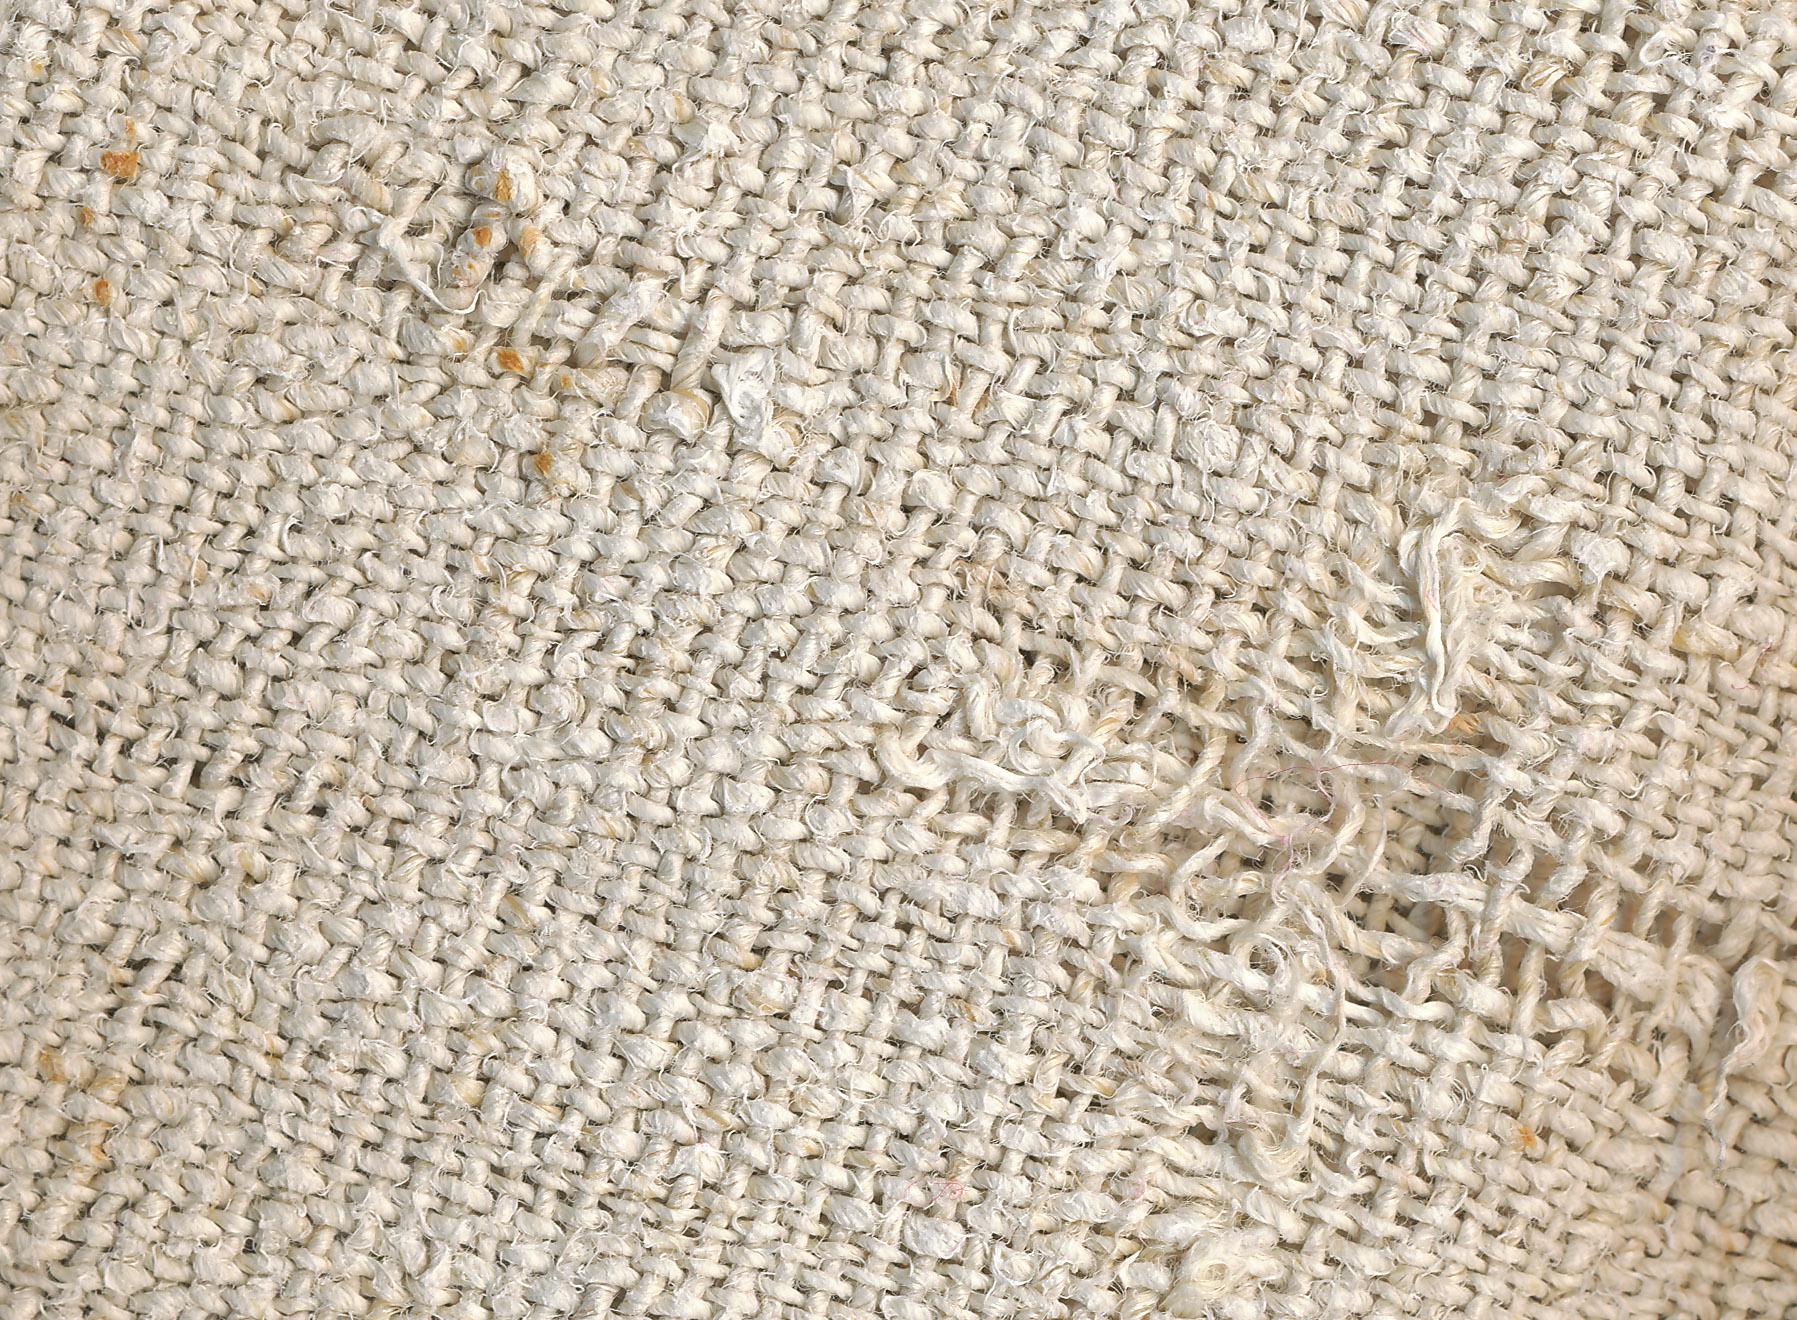 Textile texture – texturepalace.com